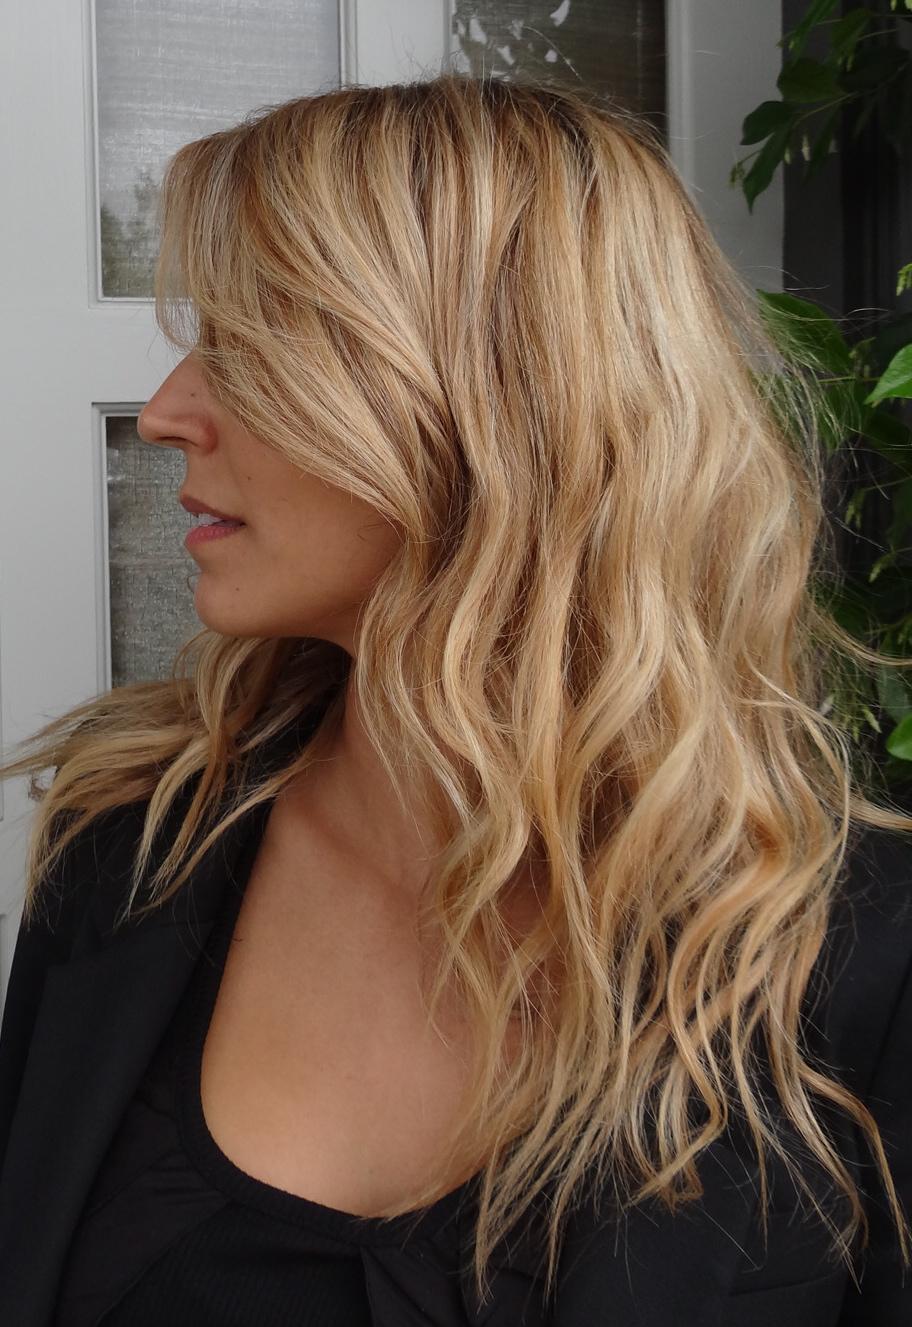 Medium Blonde Hair Colors Posted in blonde, hair color,